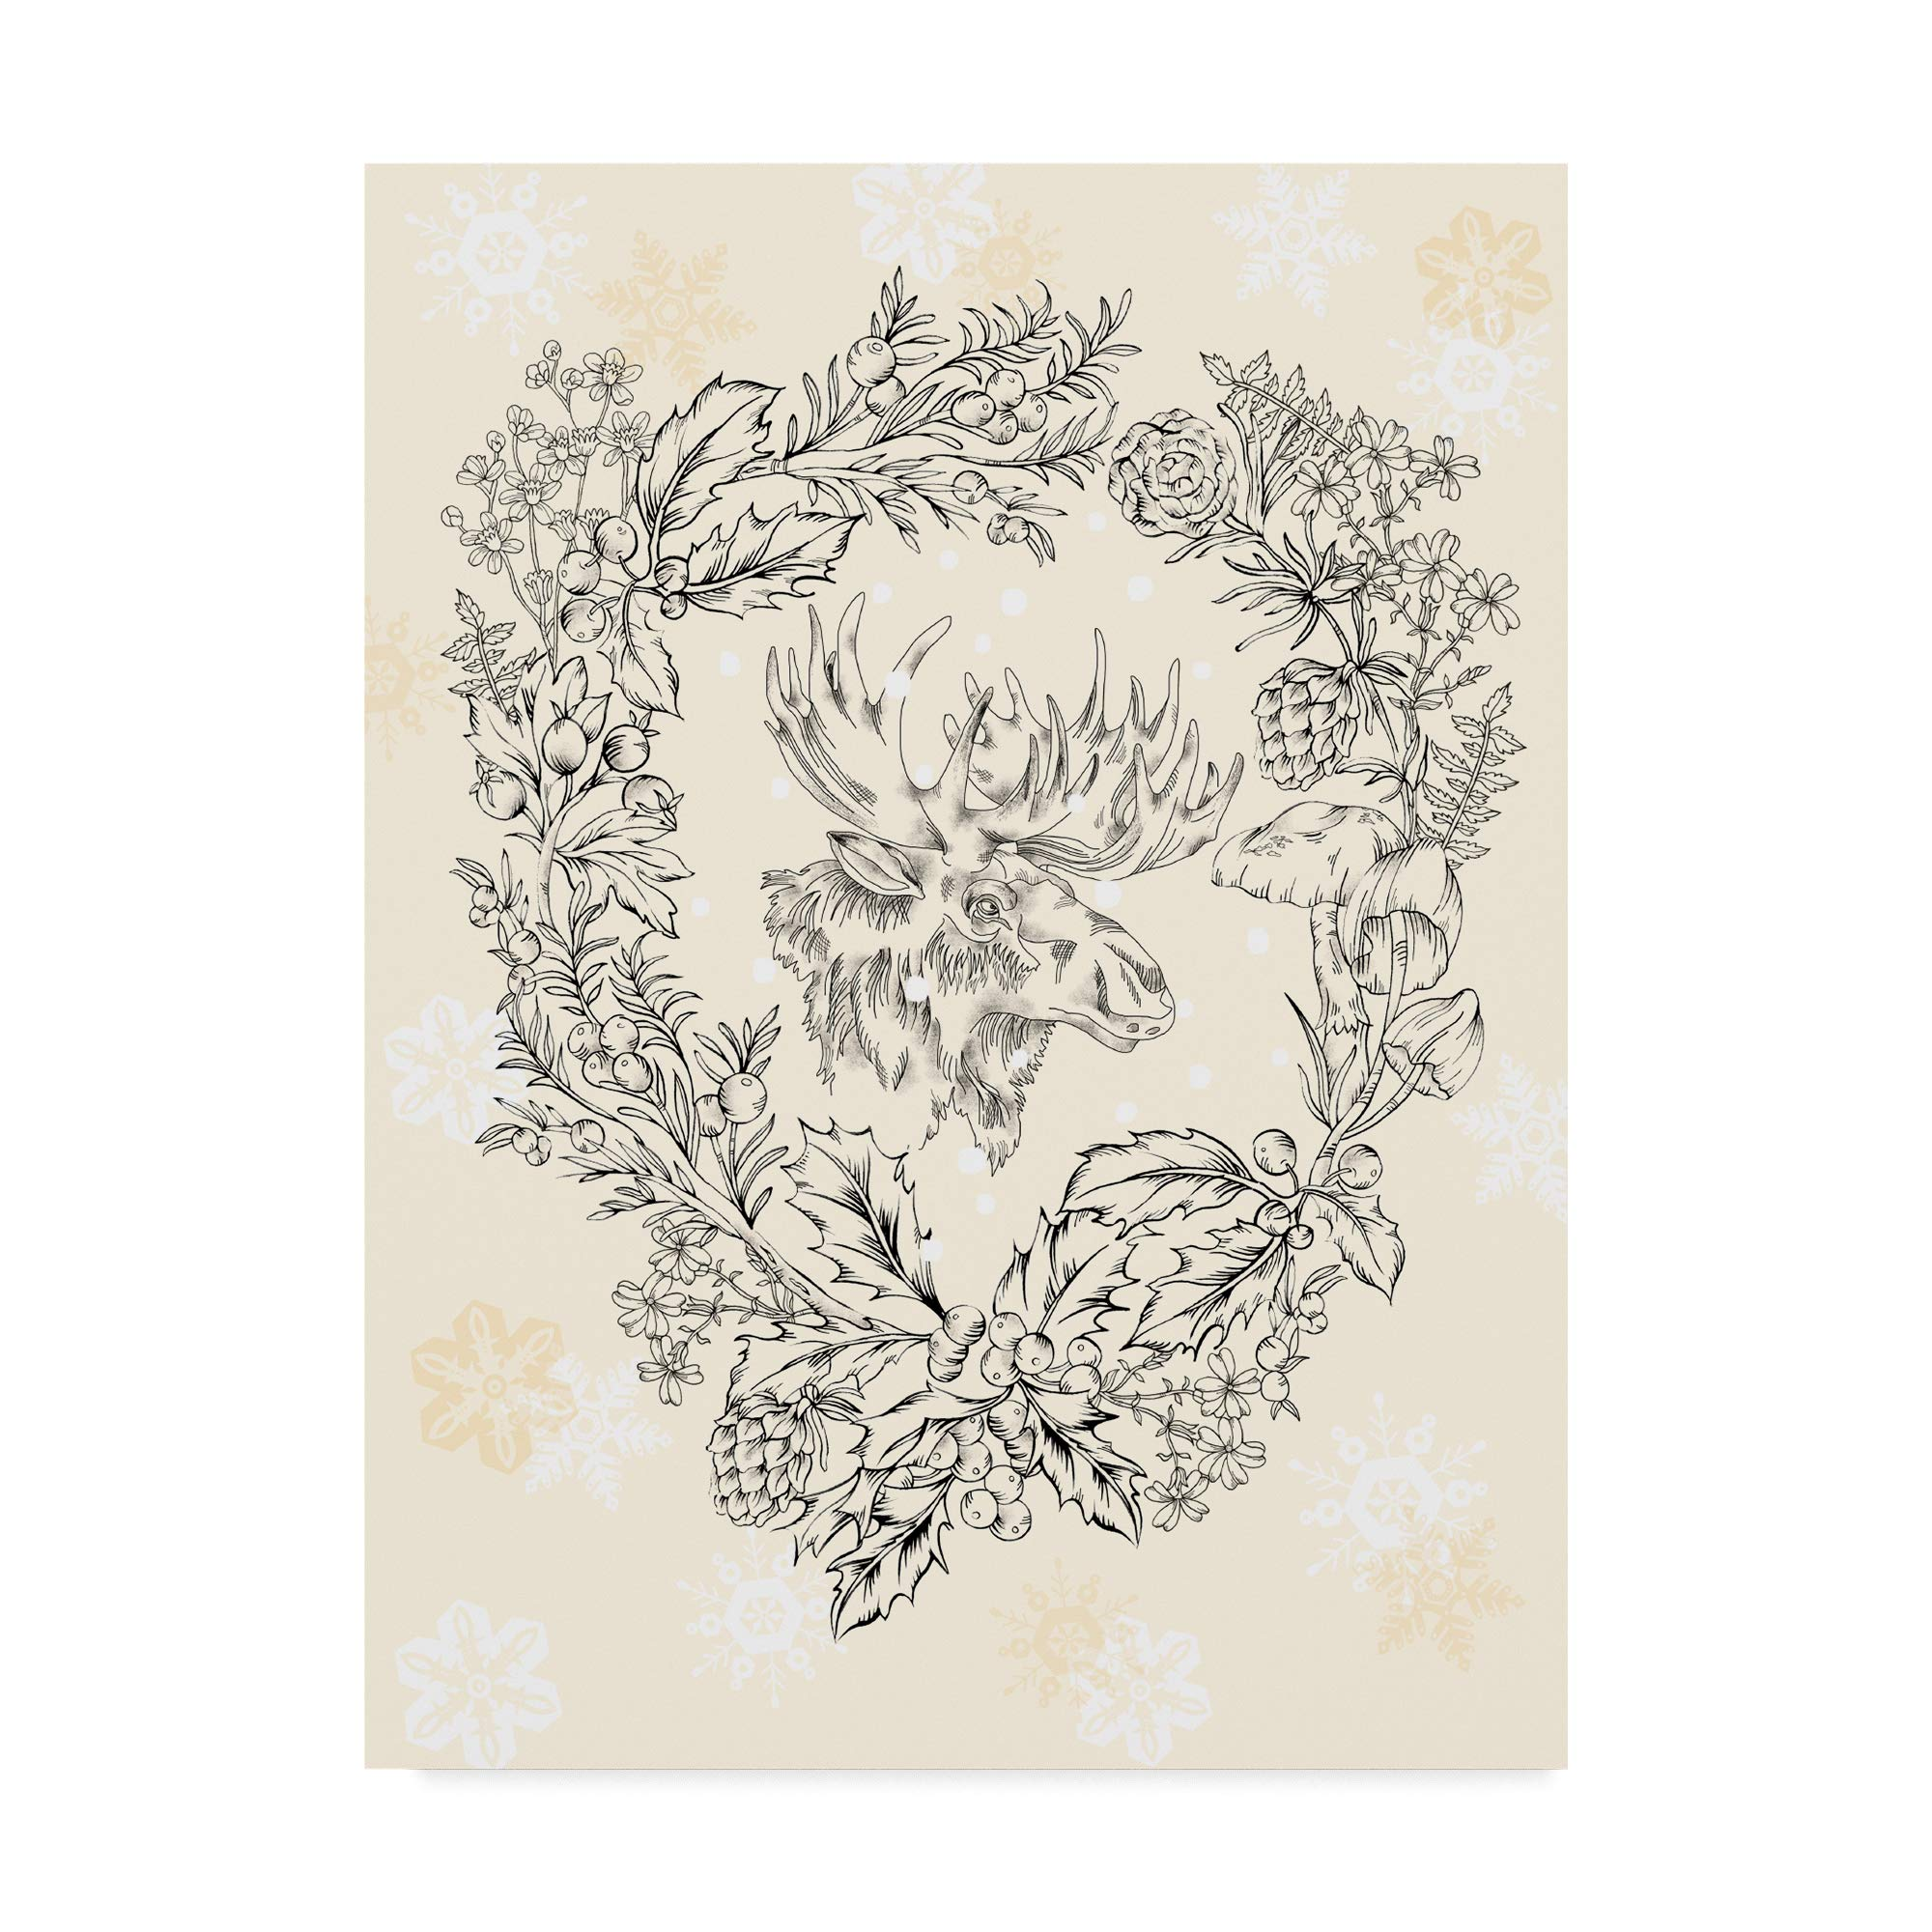 Trademark Fine Art Moose Wreath by Lisa Powell Braun, 24x32-Inch